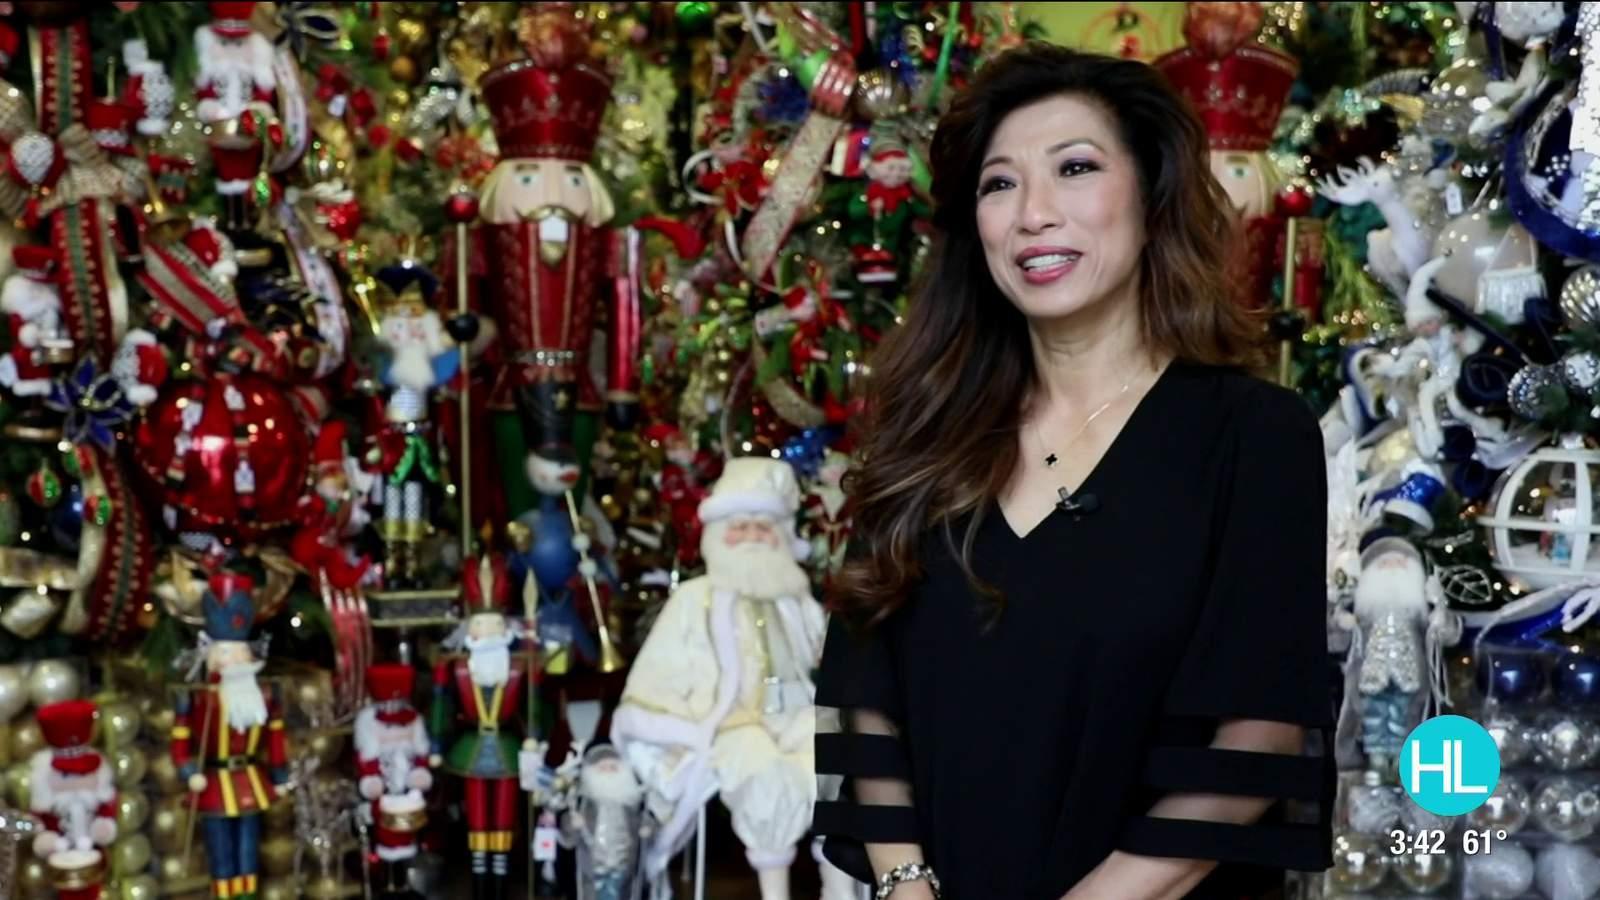 Meet the mom behind the Houston decor shop...